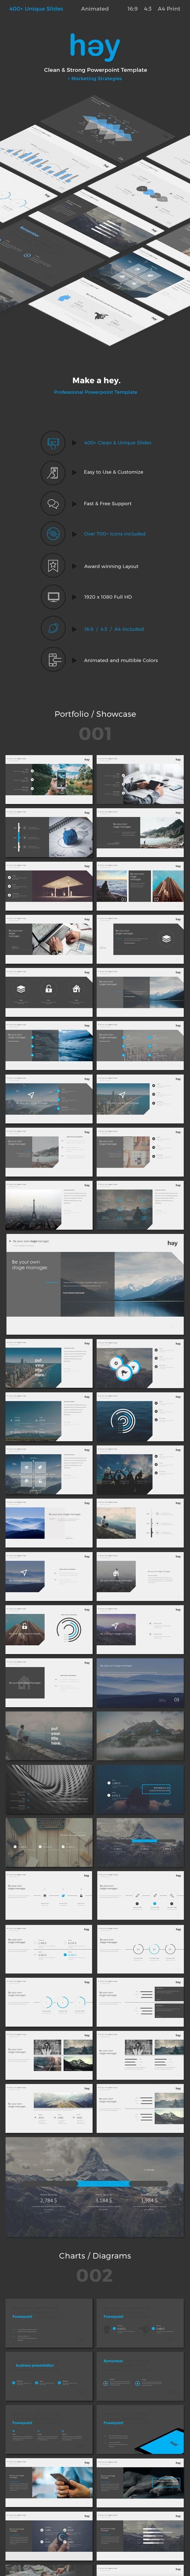 hey Powerpoint - PowerPoint Templates Presentation Templates